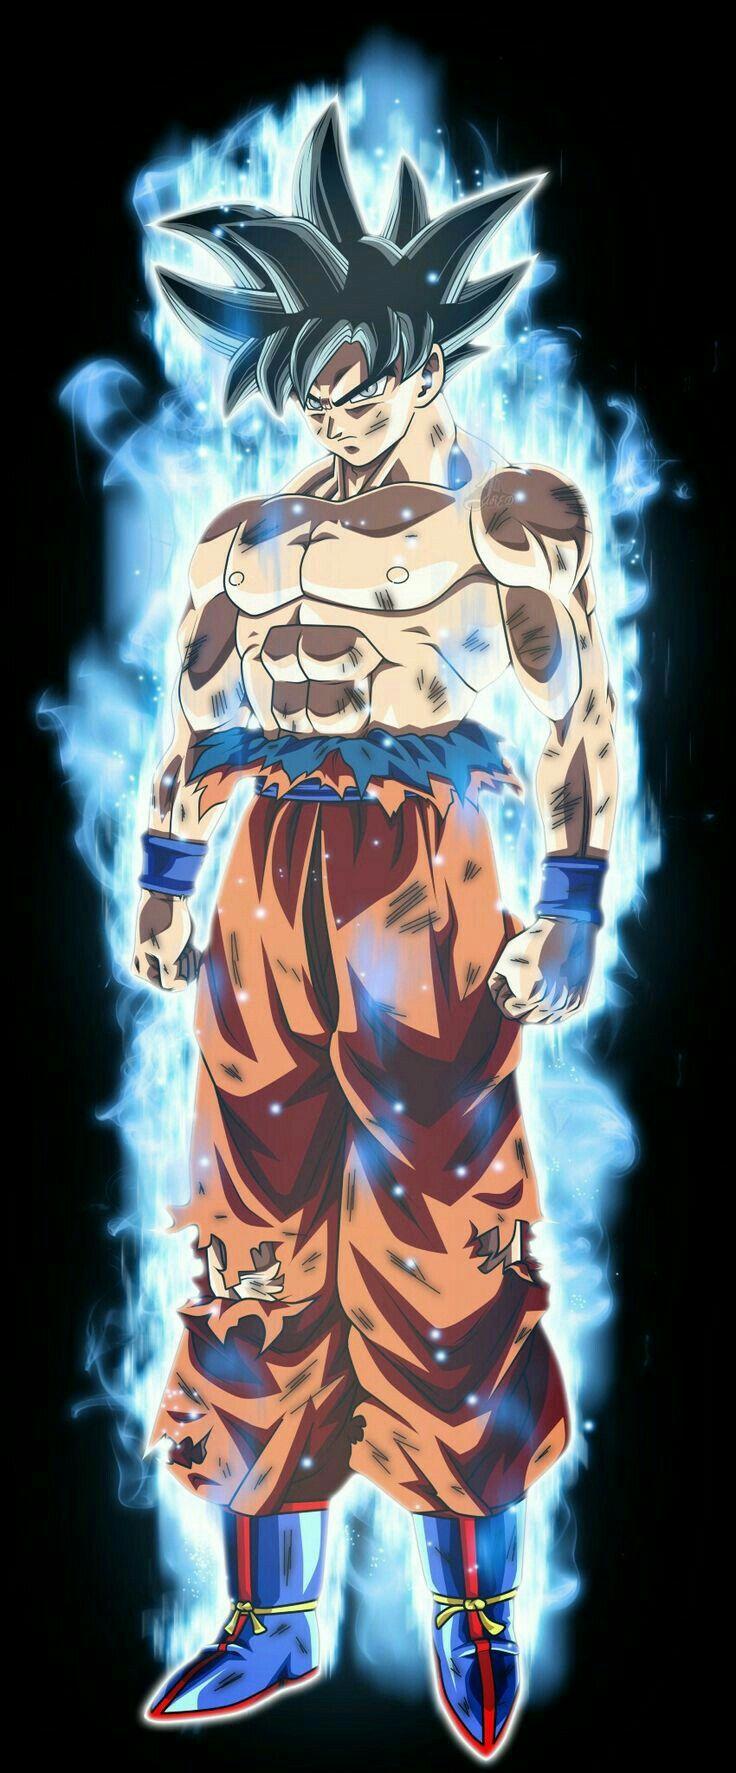 Goku Limit Braker Personajes De Dragon Ball Dragones Dragon Ball